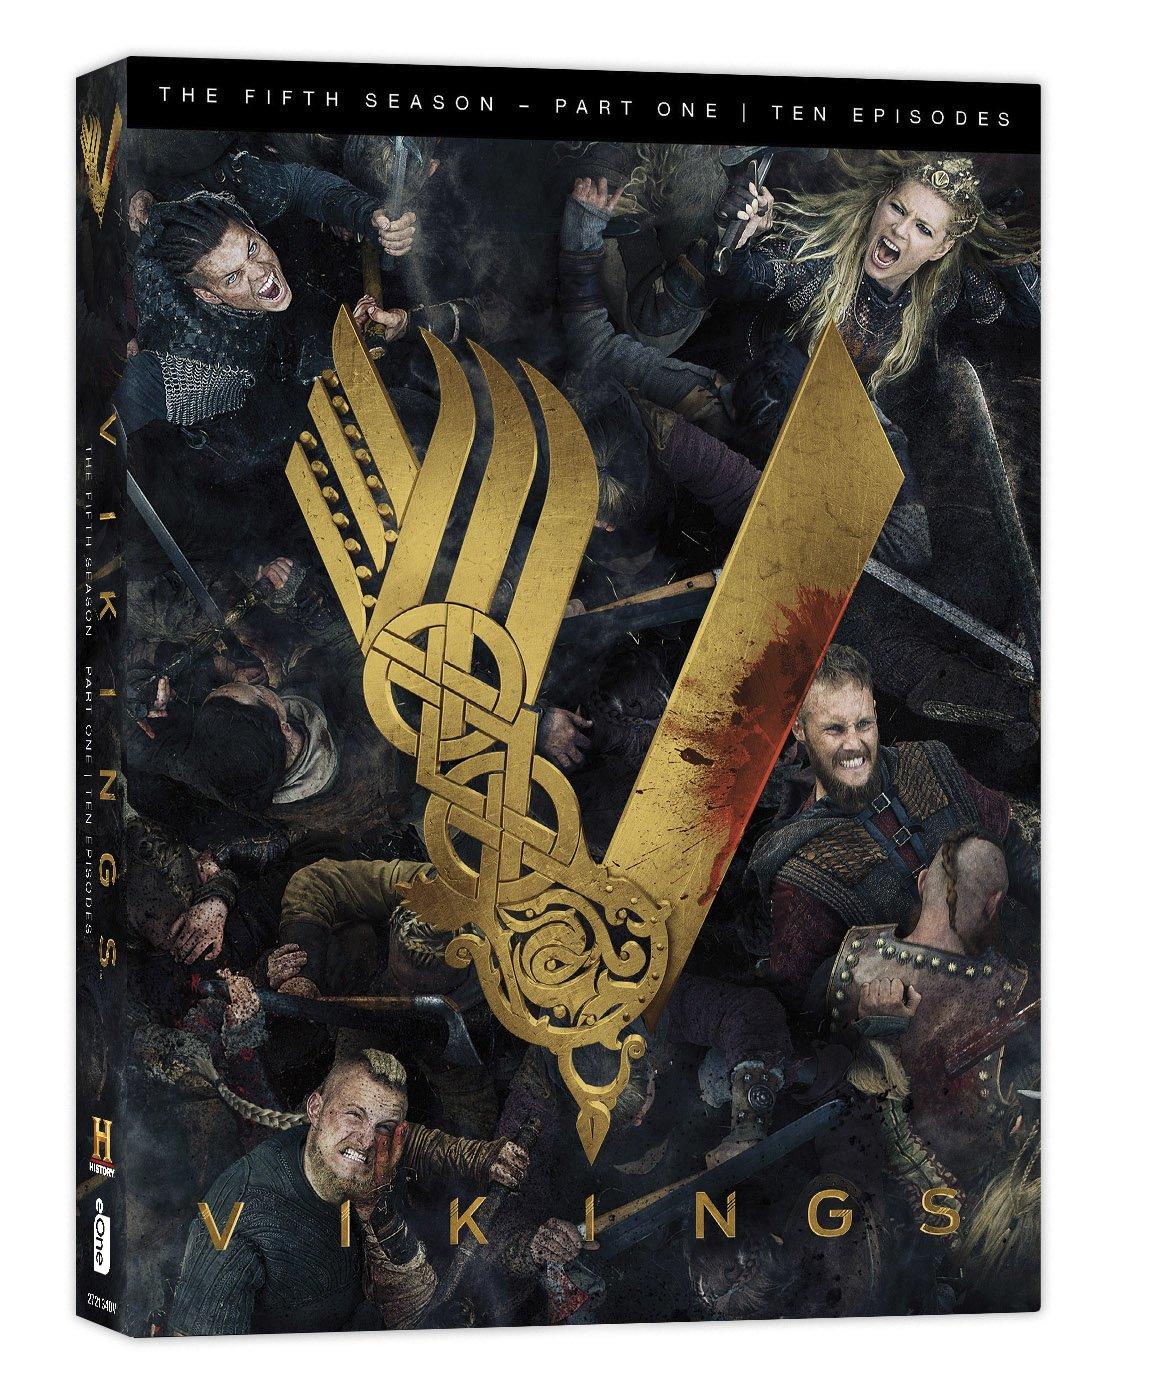 Vikings: Season 5 - Part 1 Various eOne eOne Films Distribution